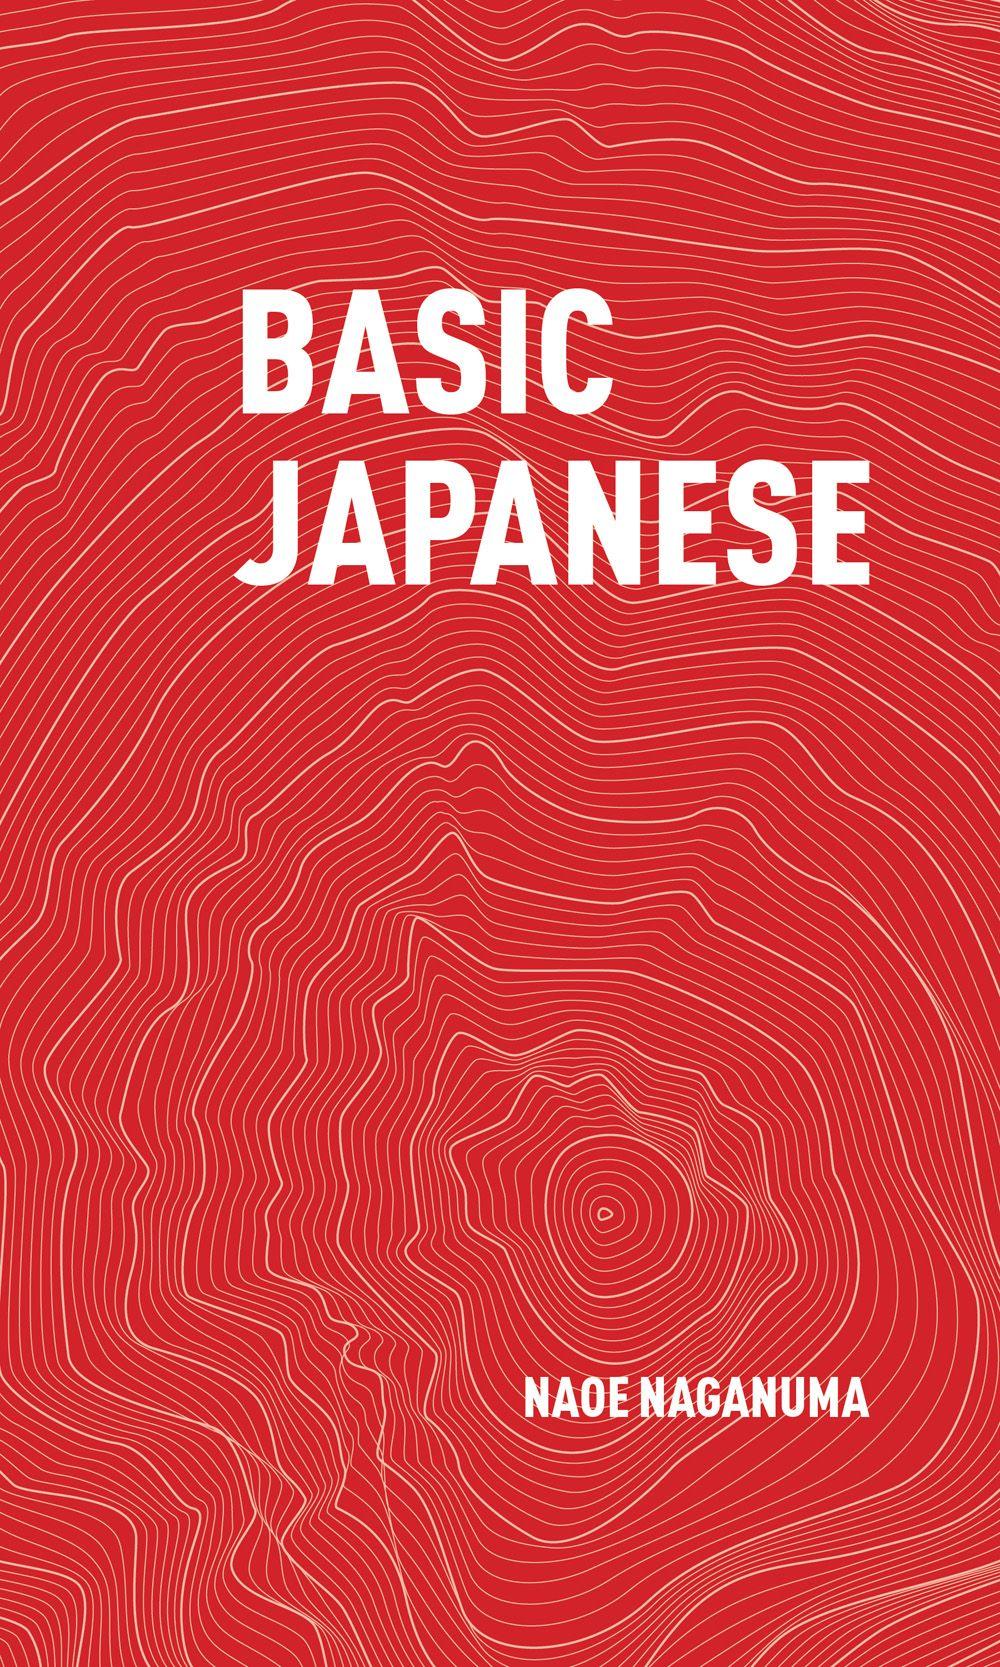 traditional japanese minimalist graphic design - Google Search